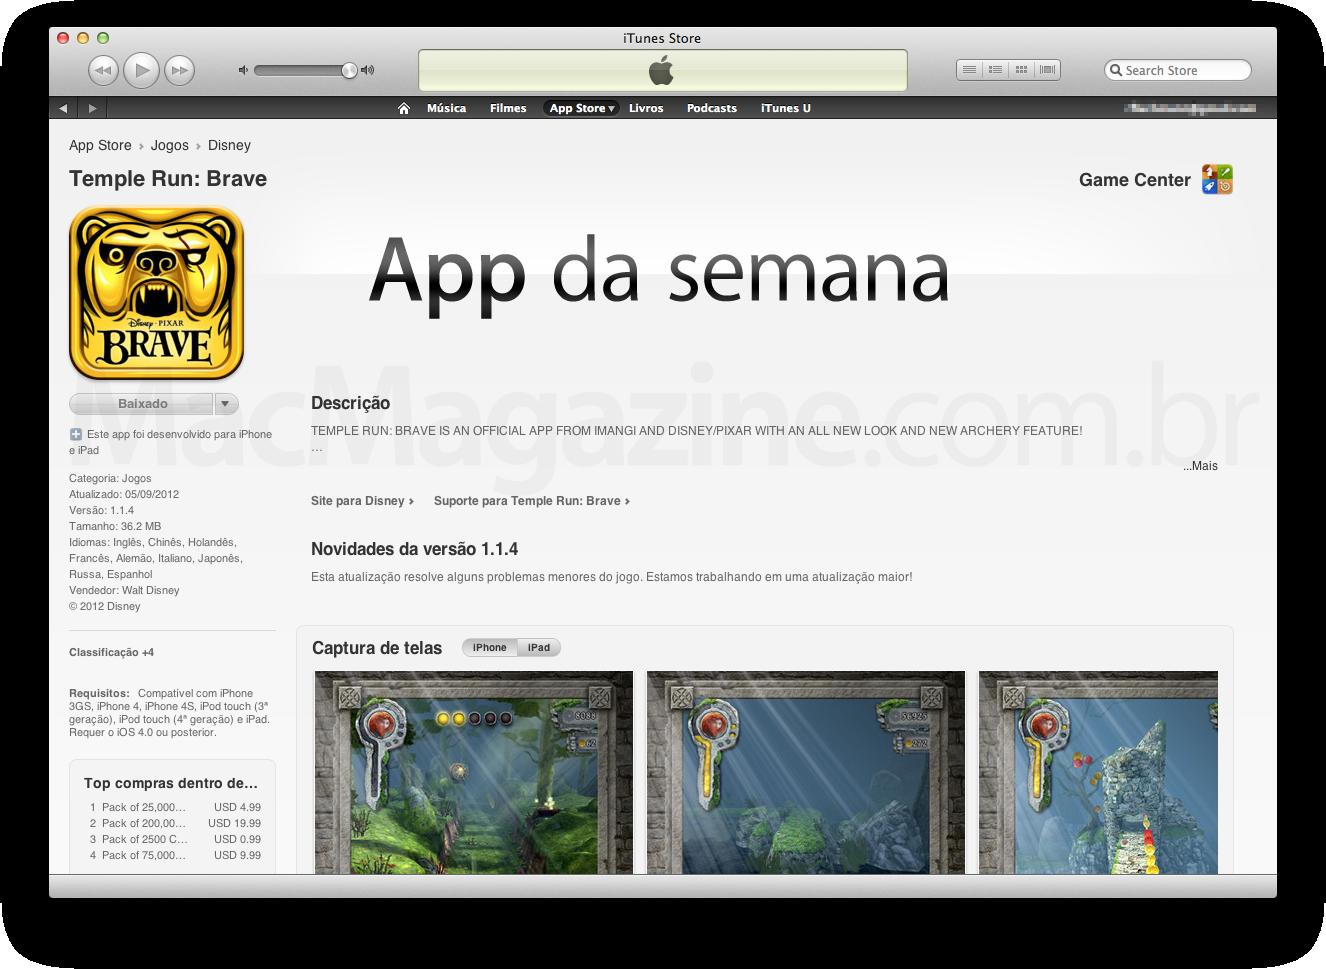 Temple Run: Brave como App da Semana